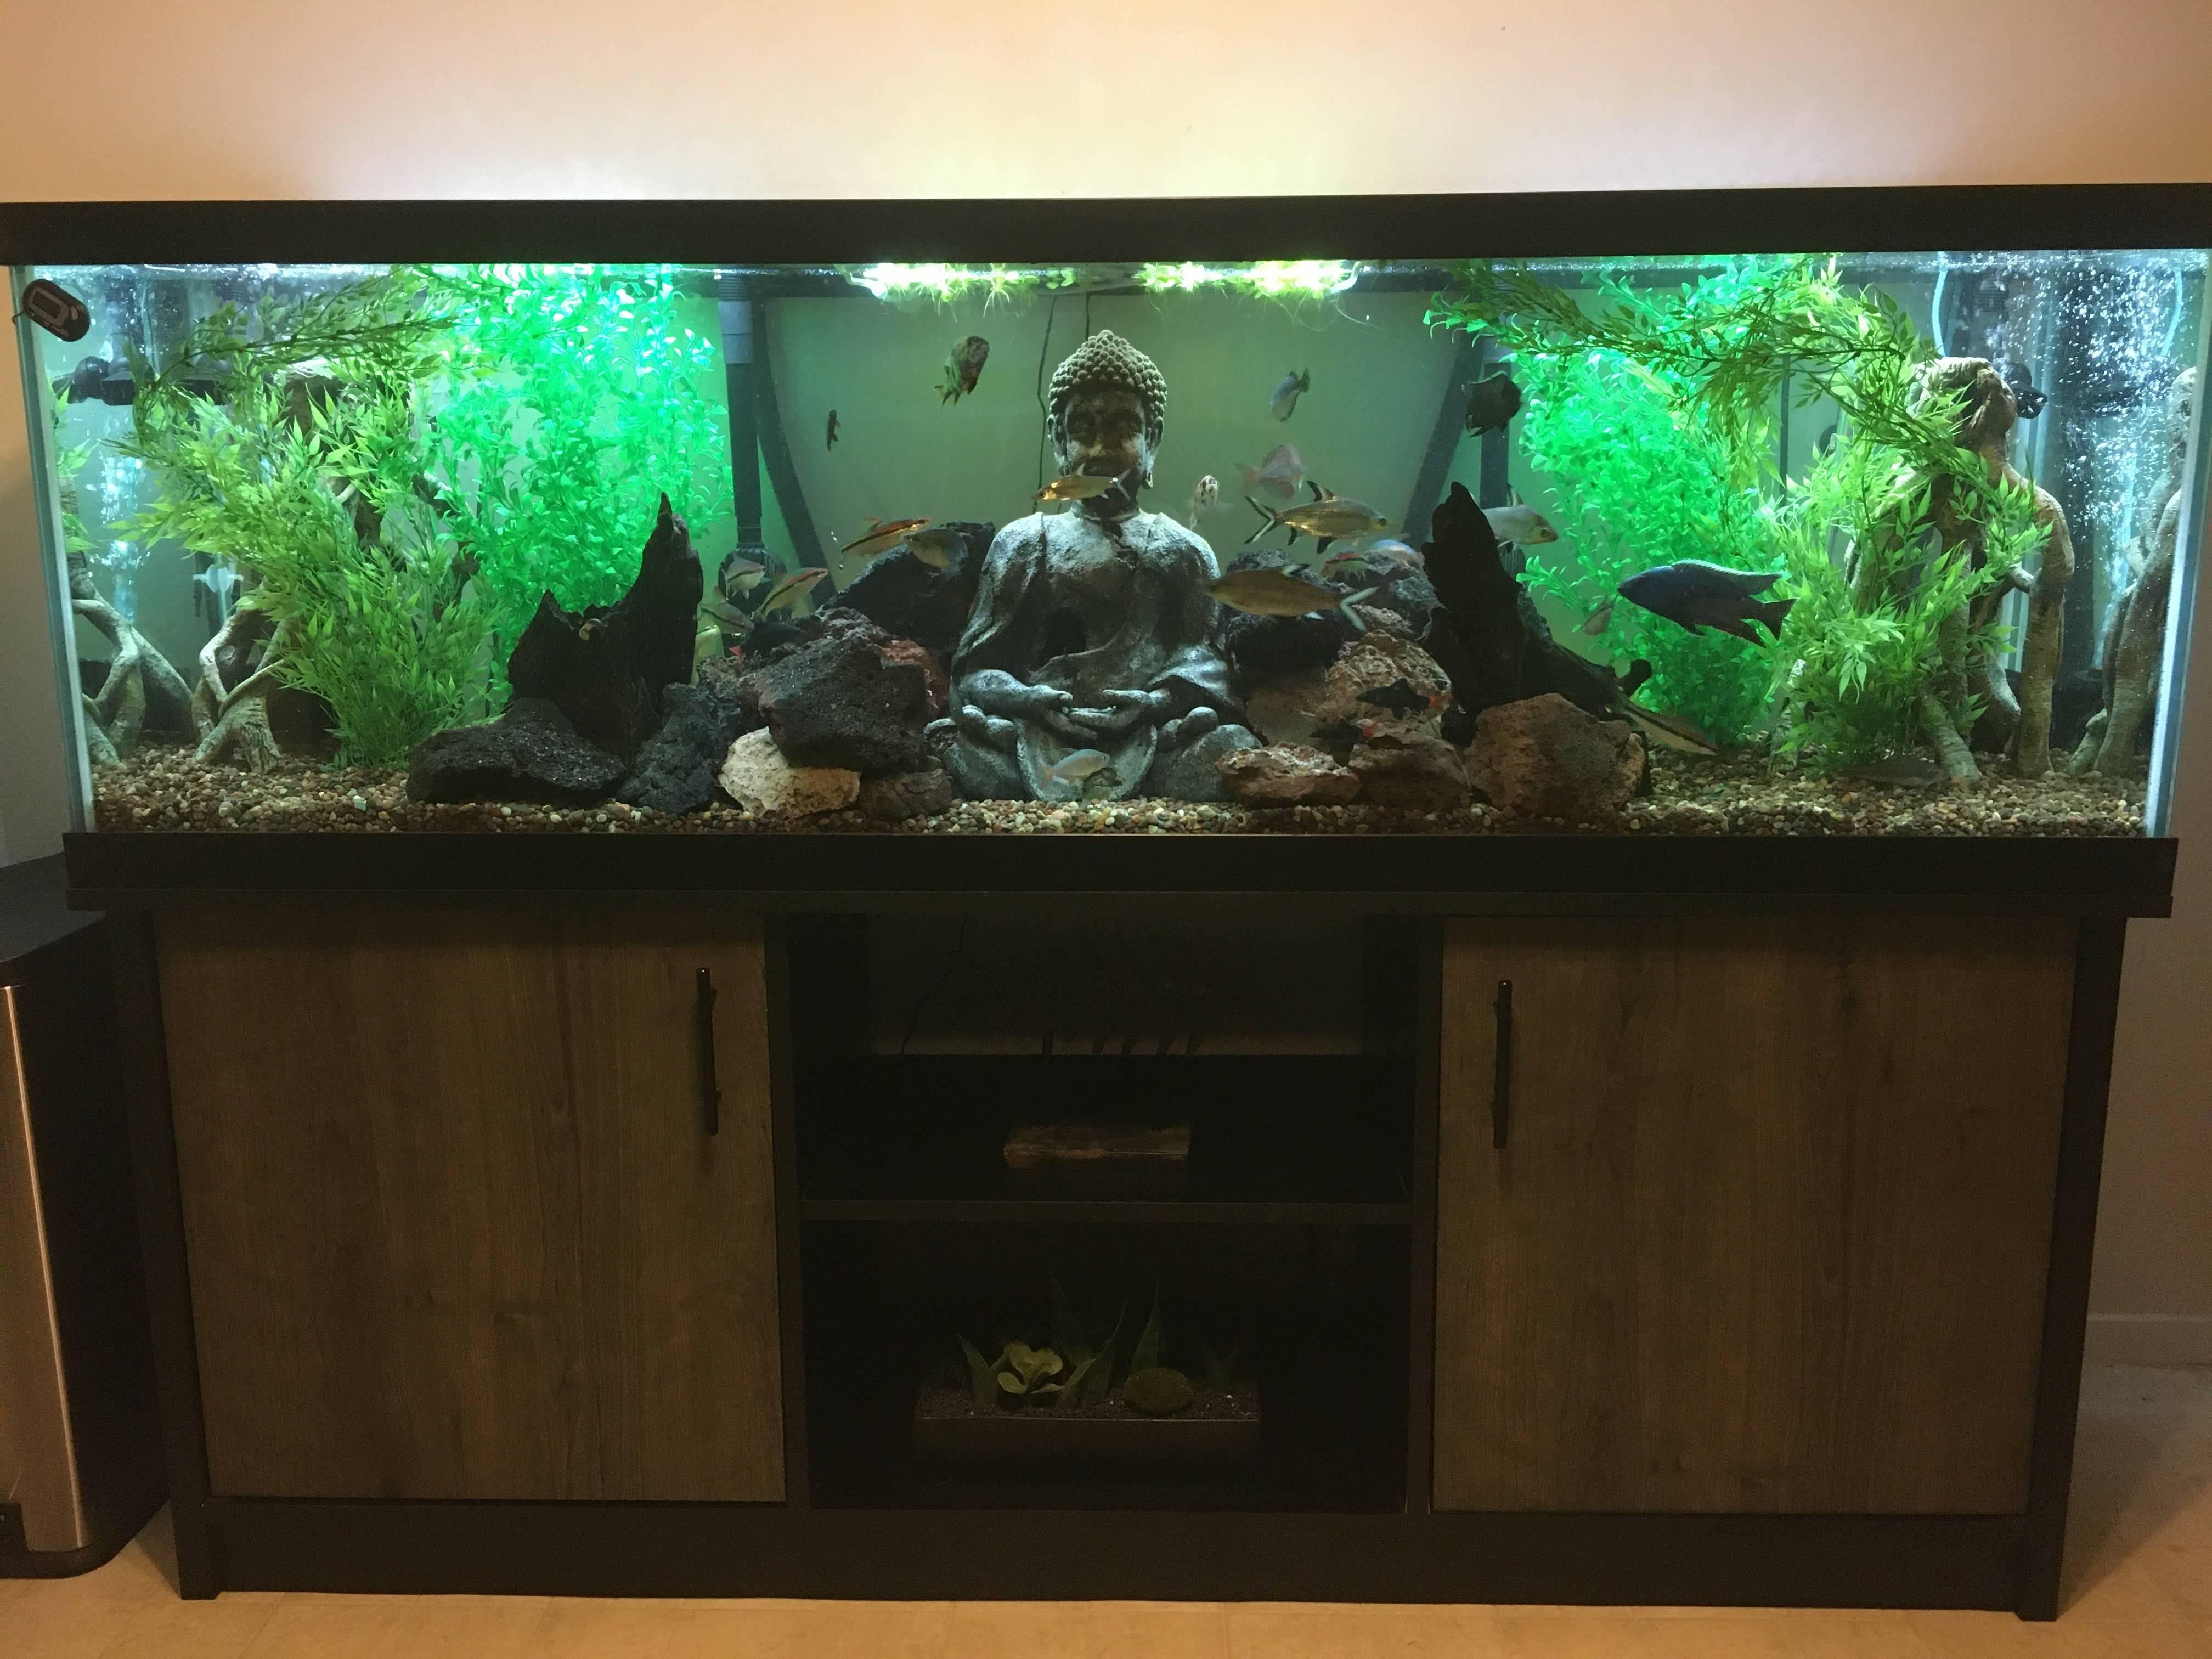 Heath's stunning aquascape